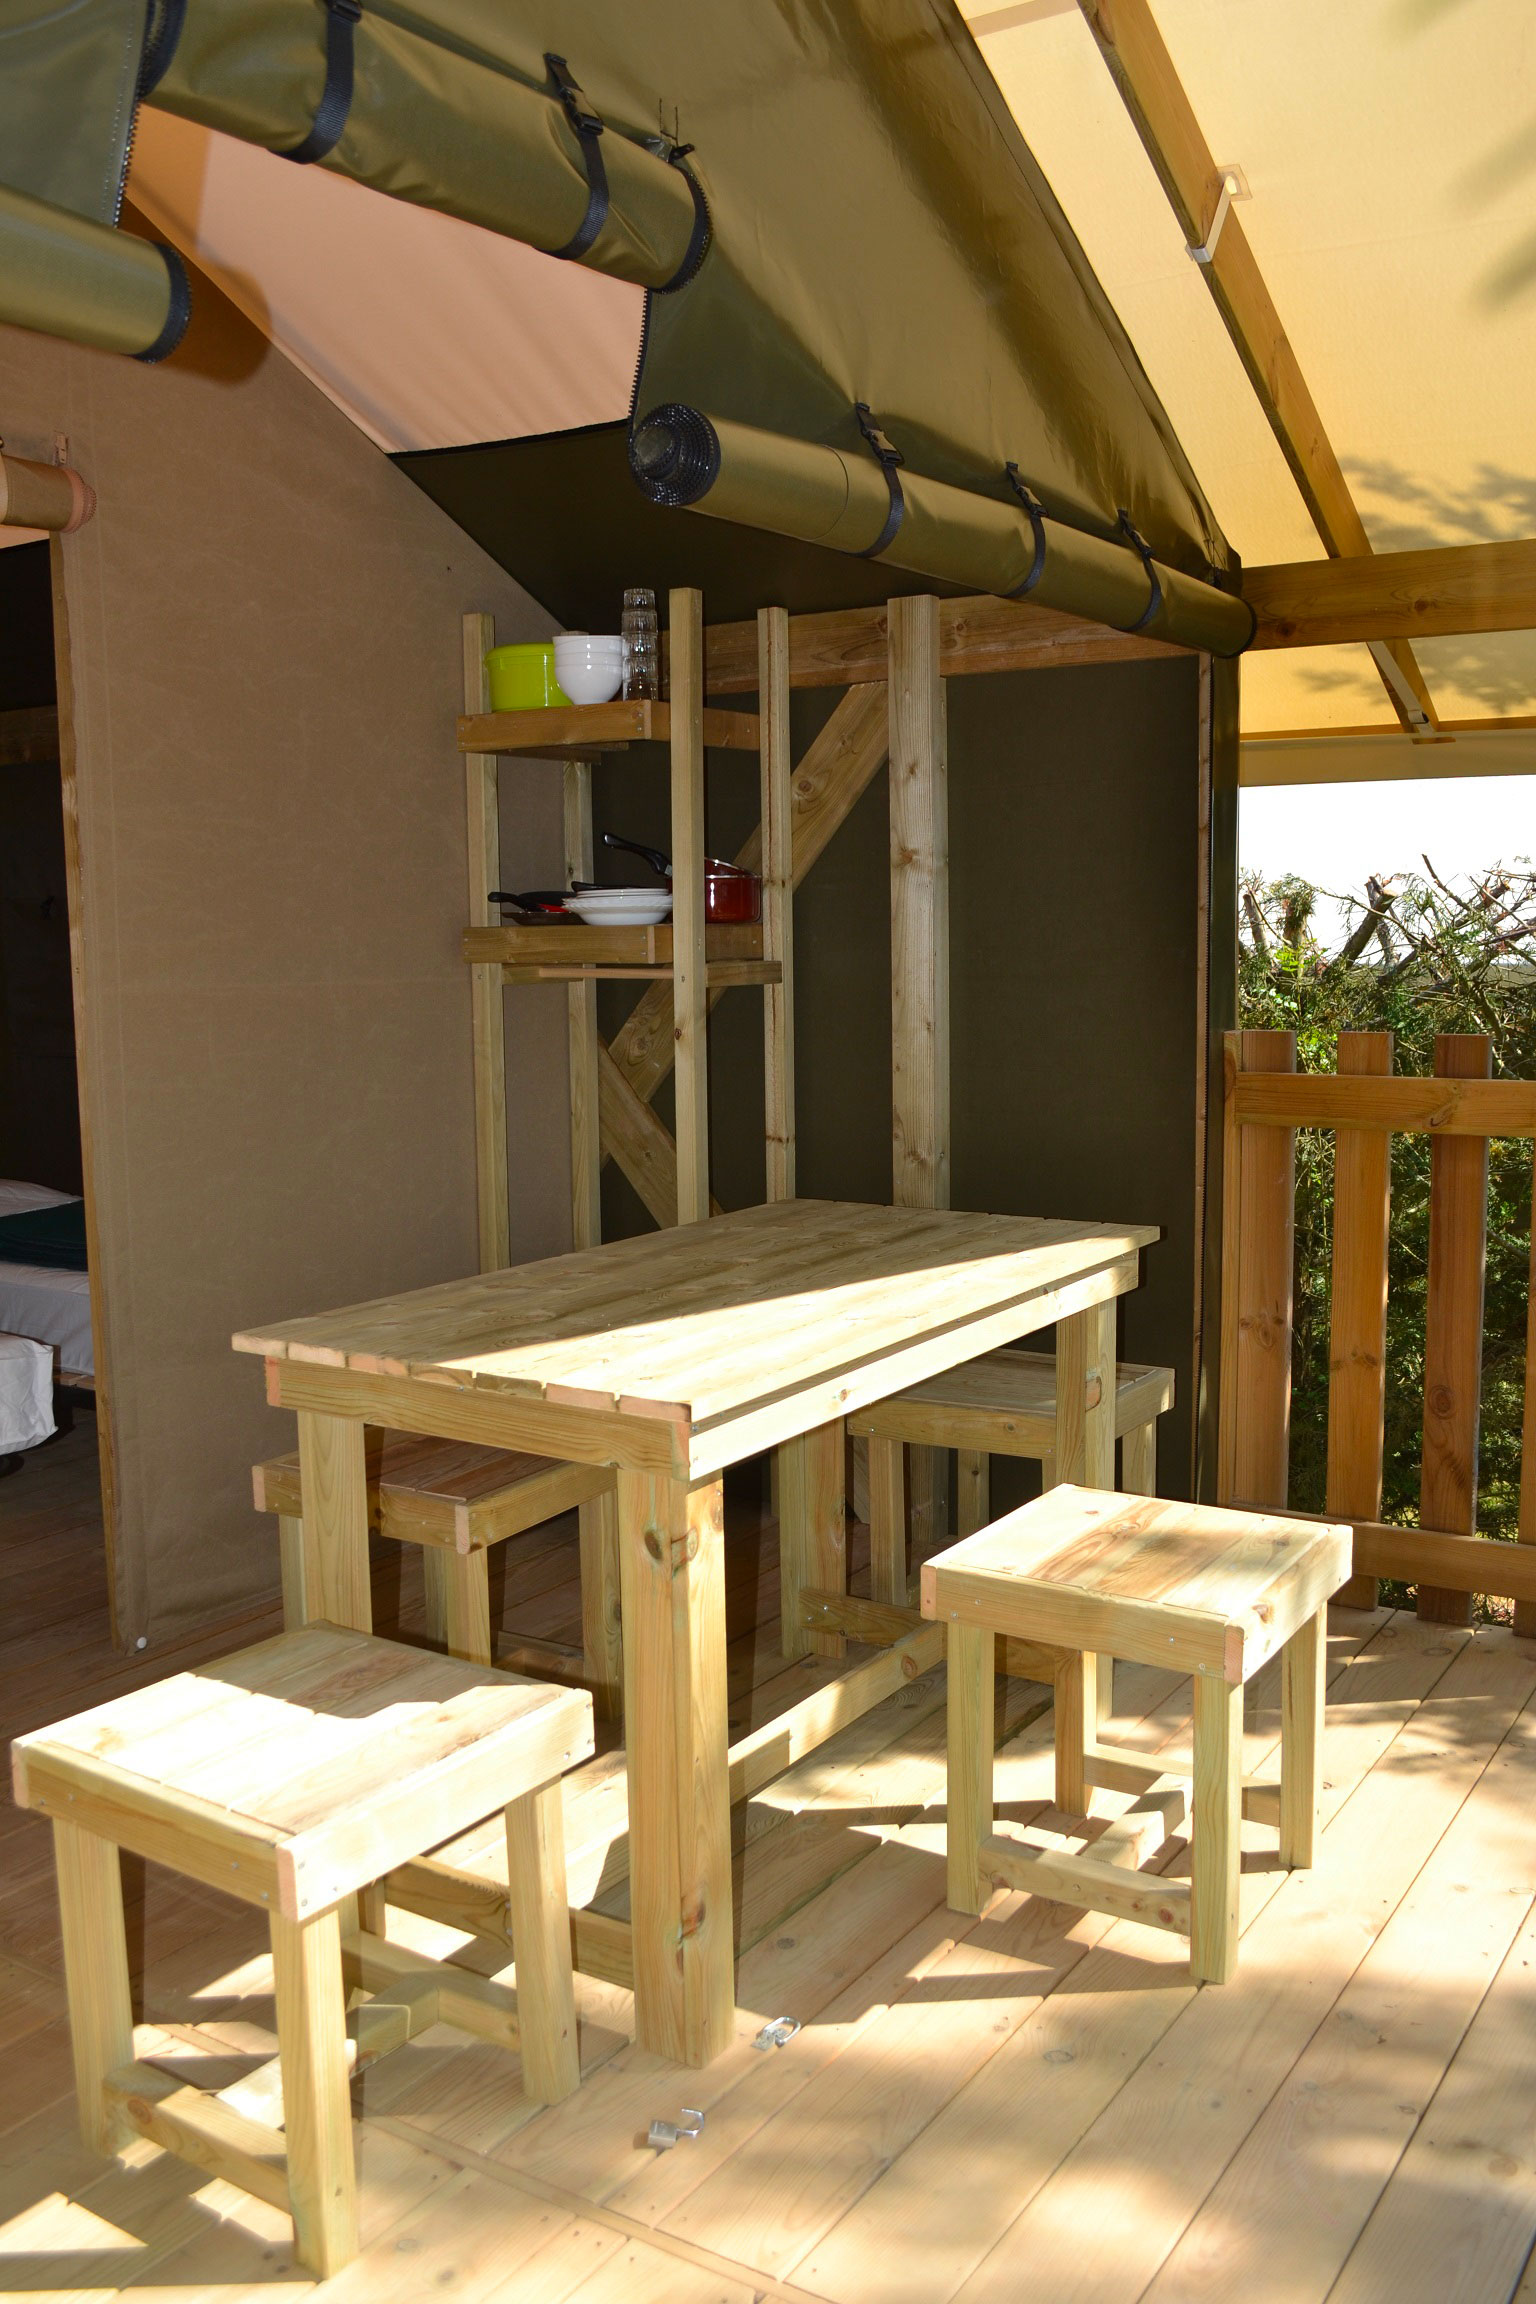 galerie-photos-camping-avec-tente-lodge-5-pers-terrasse-camping-le-port-de-moricq